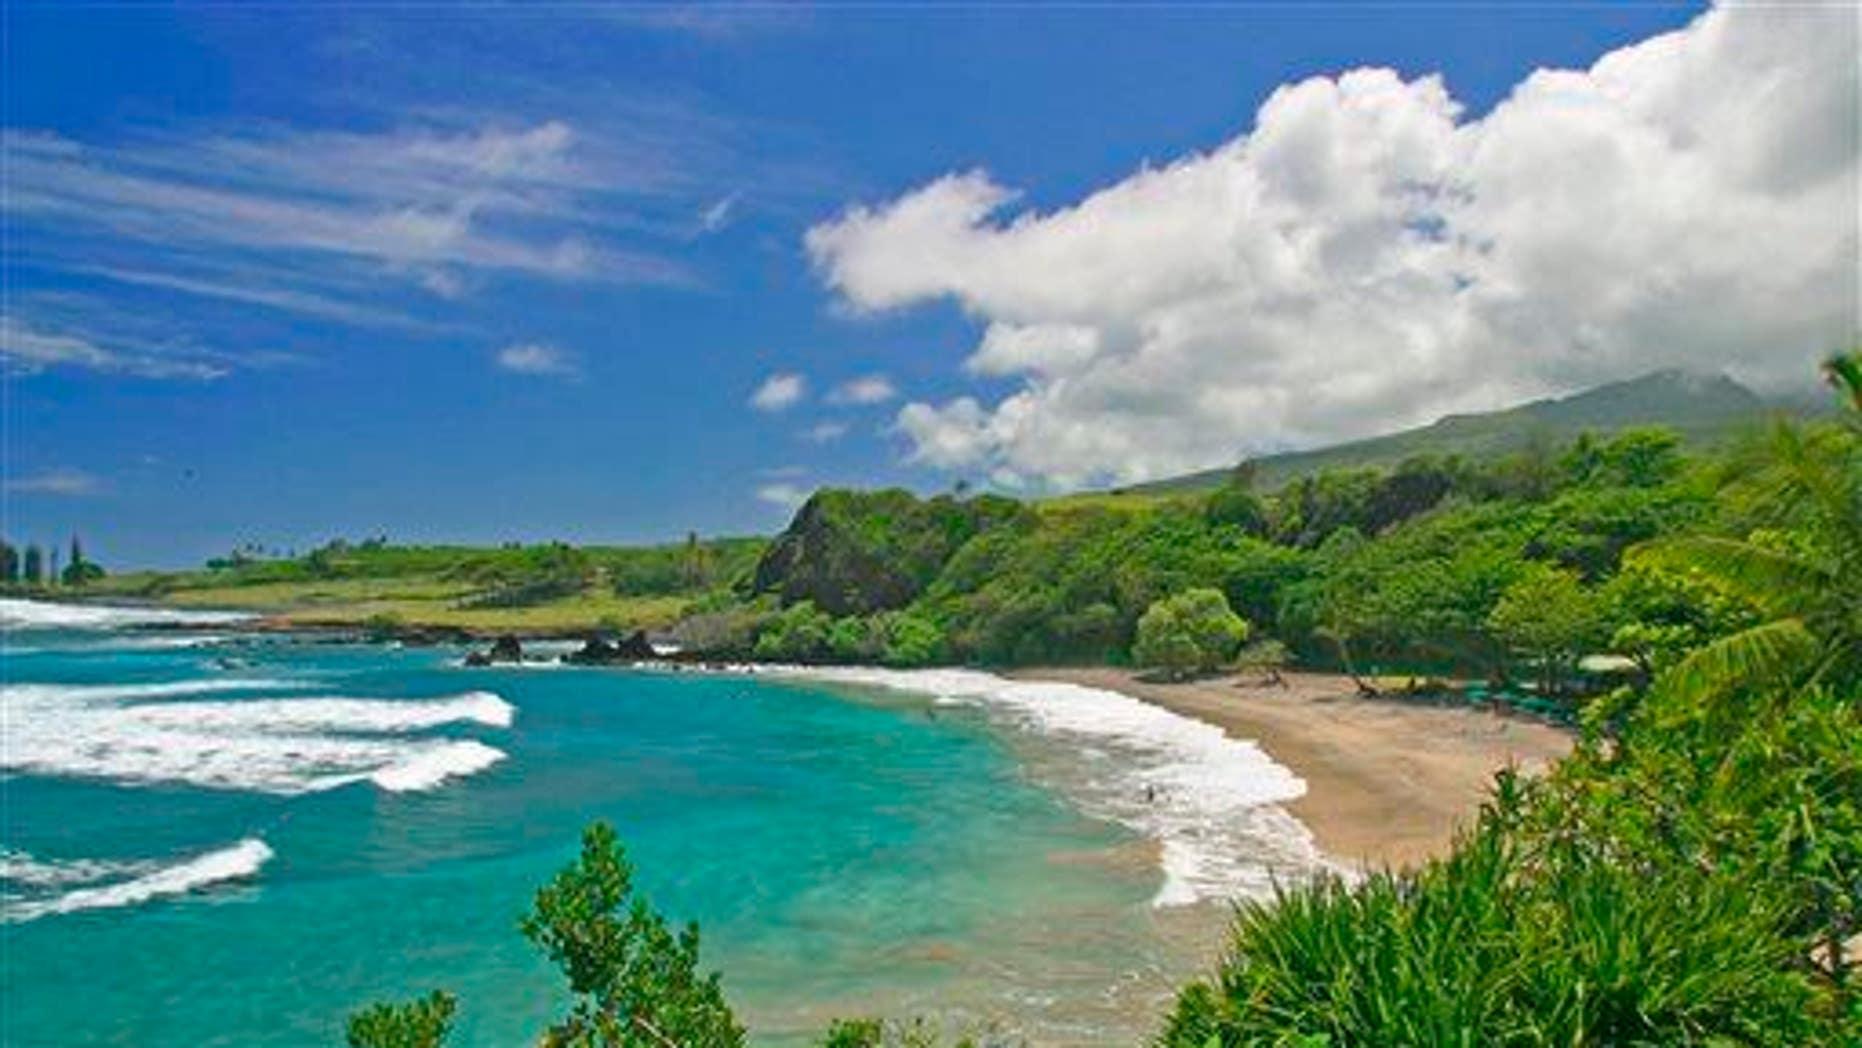 This undated file photo provided by Ron Dahlquist for the Maui Visitors Bureau shows Hamoa Beach in Maui, Hawaii.